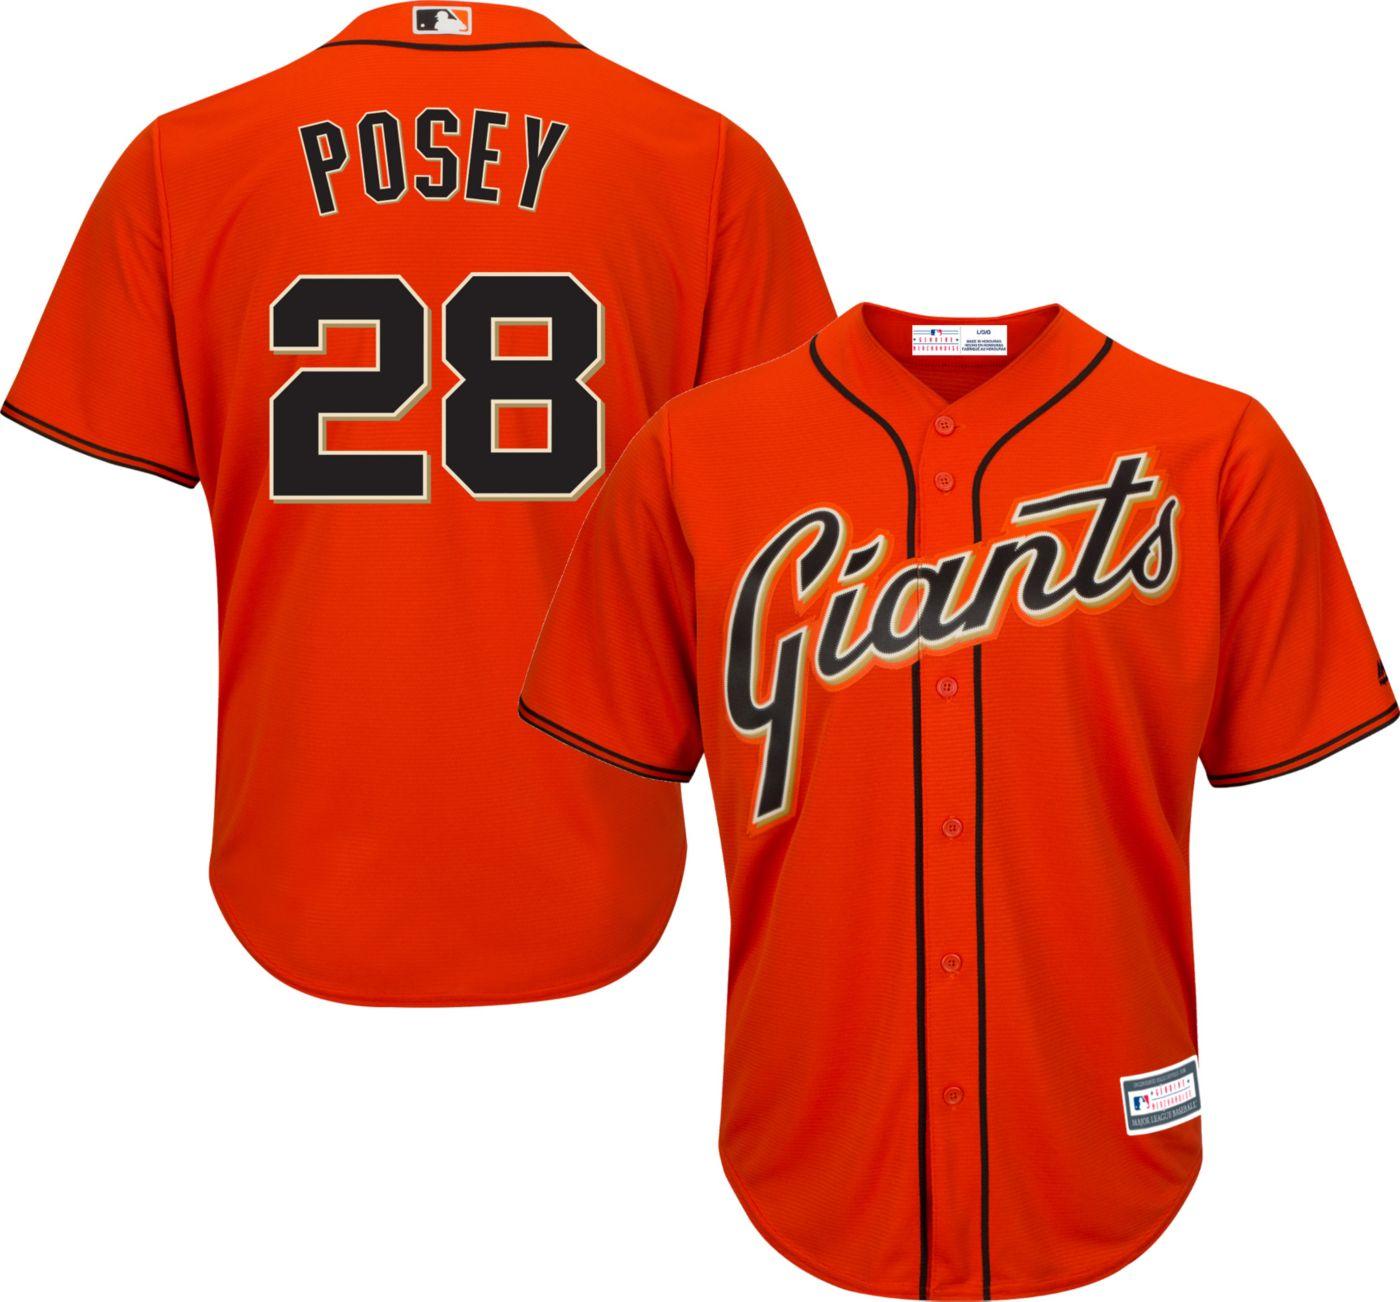 Youth Replica San Francisco Giants Buster Posey #28 Alternate Orange Jersey